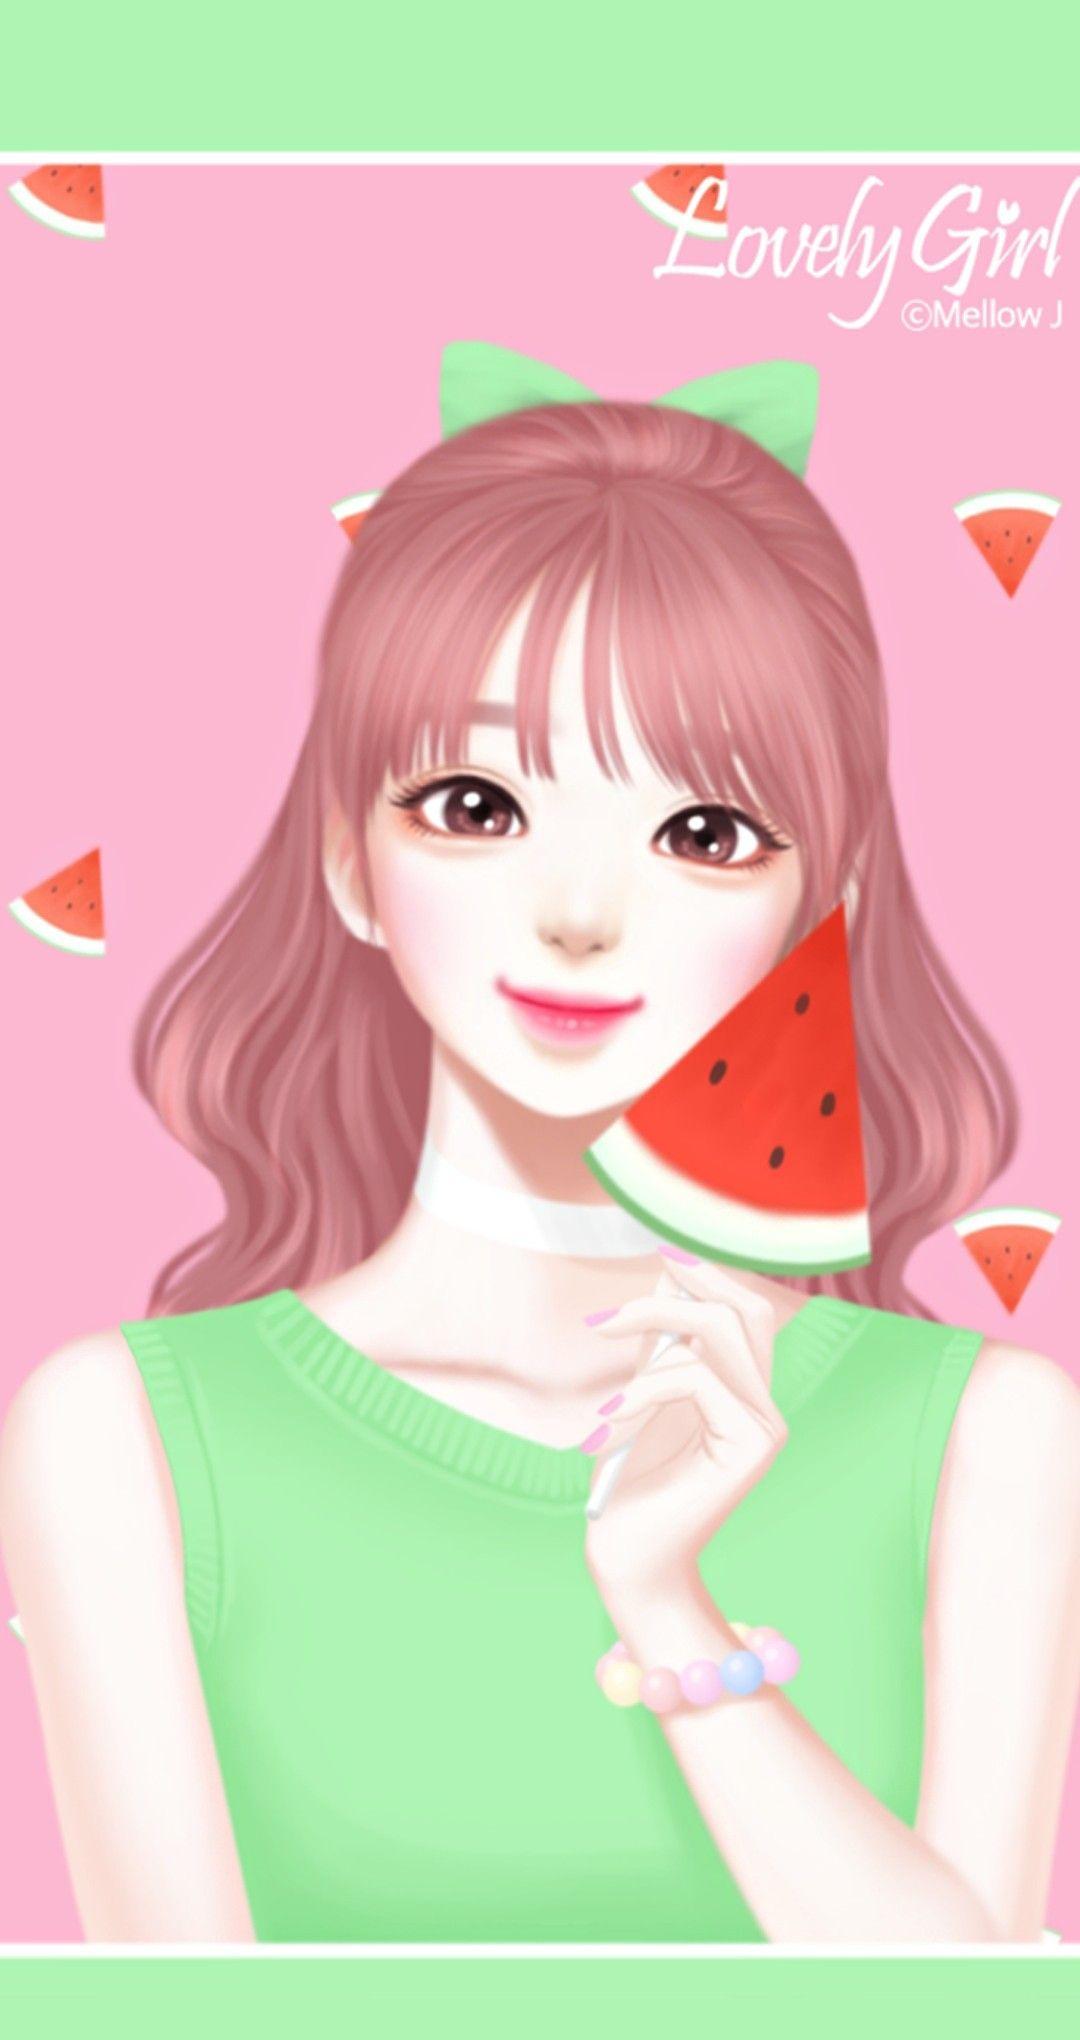 Enakei Gadis Animasi Anime Gadis Cantik Gadis Lucu